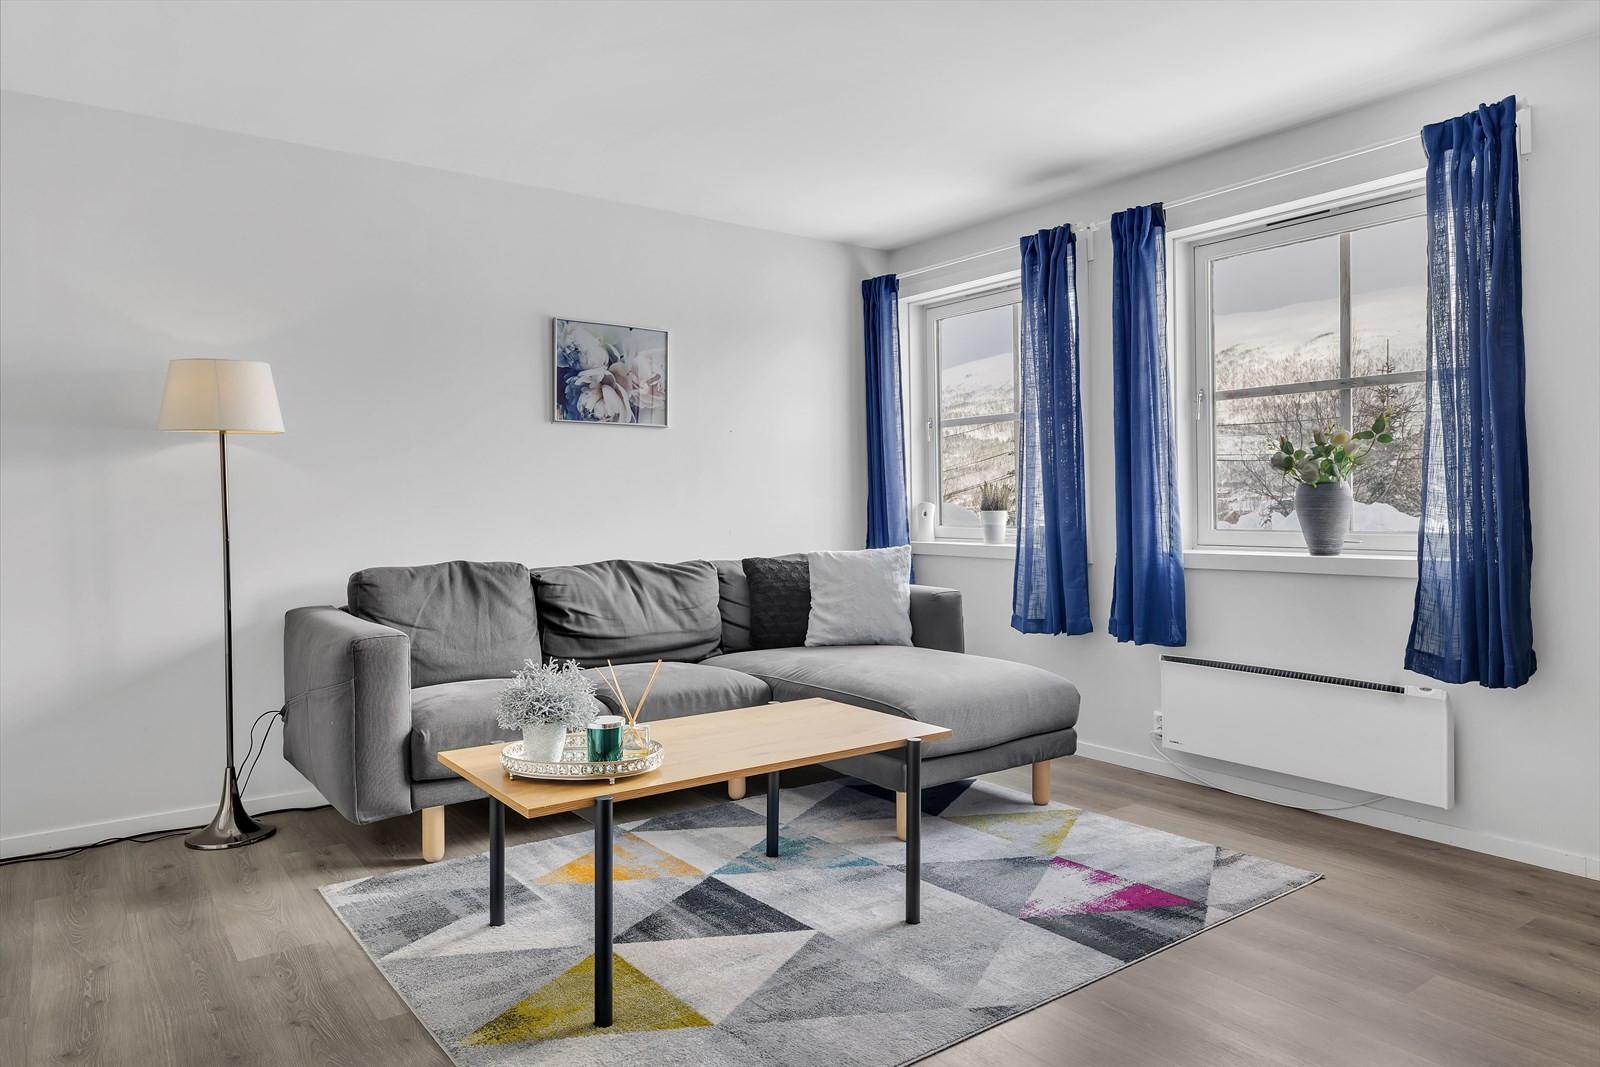 Stue leilighet underetasje